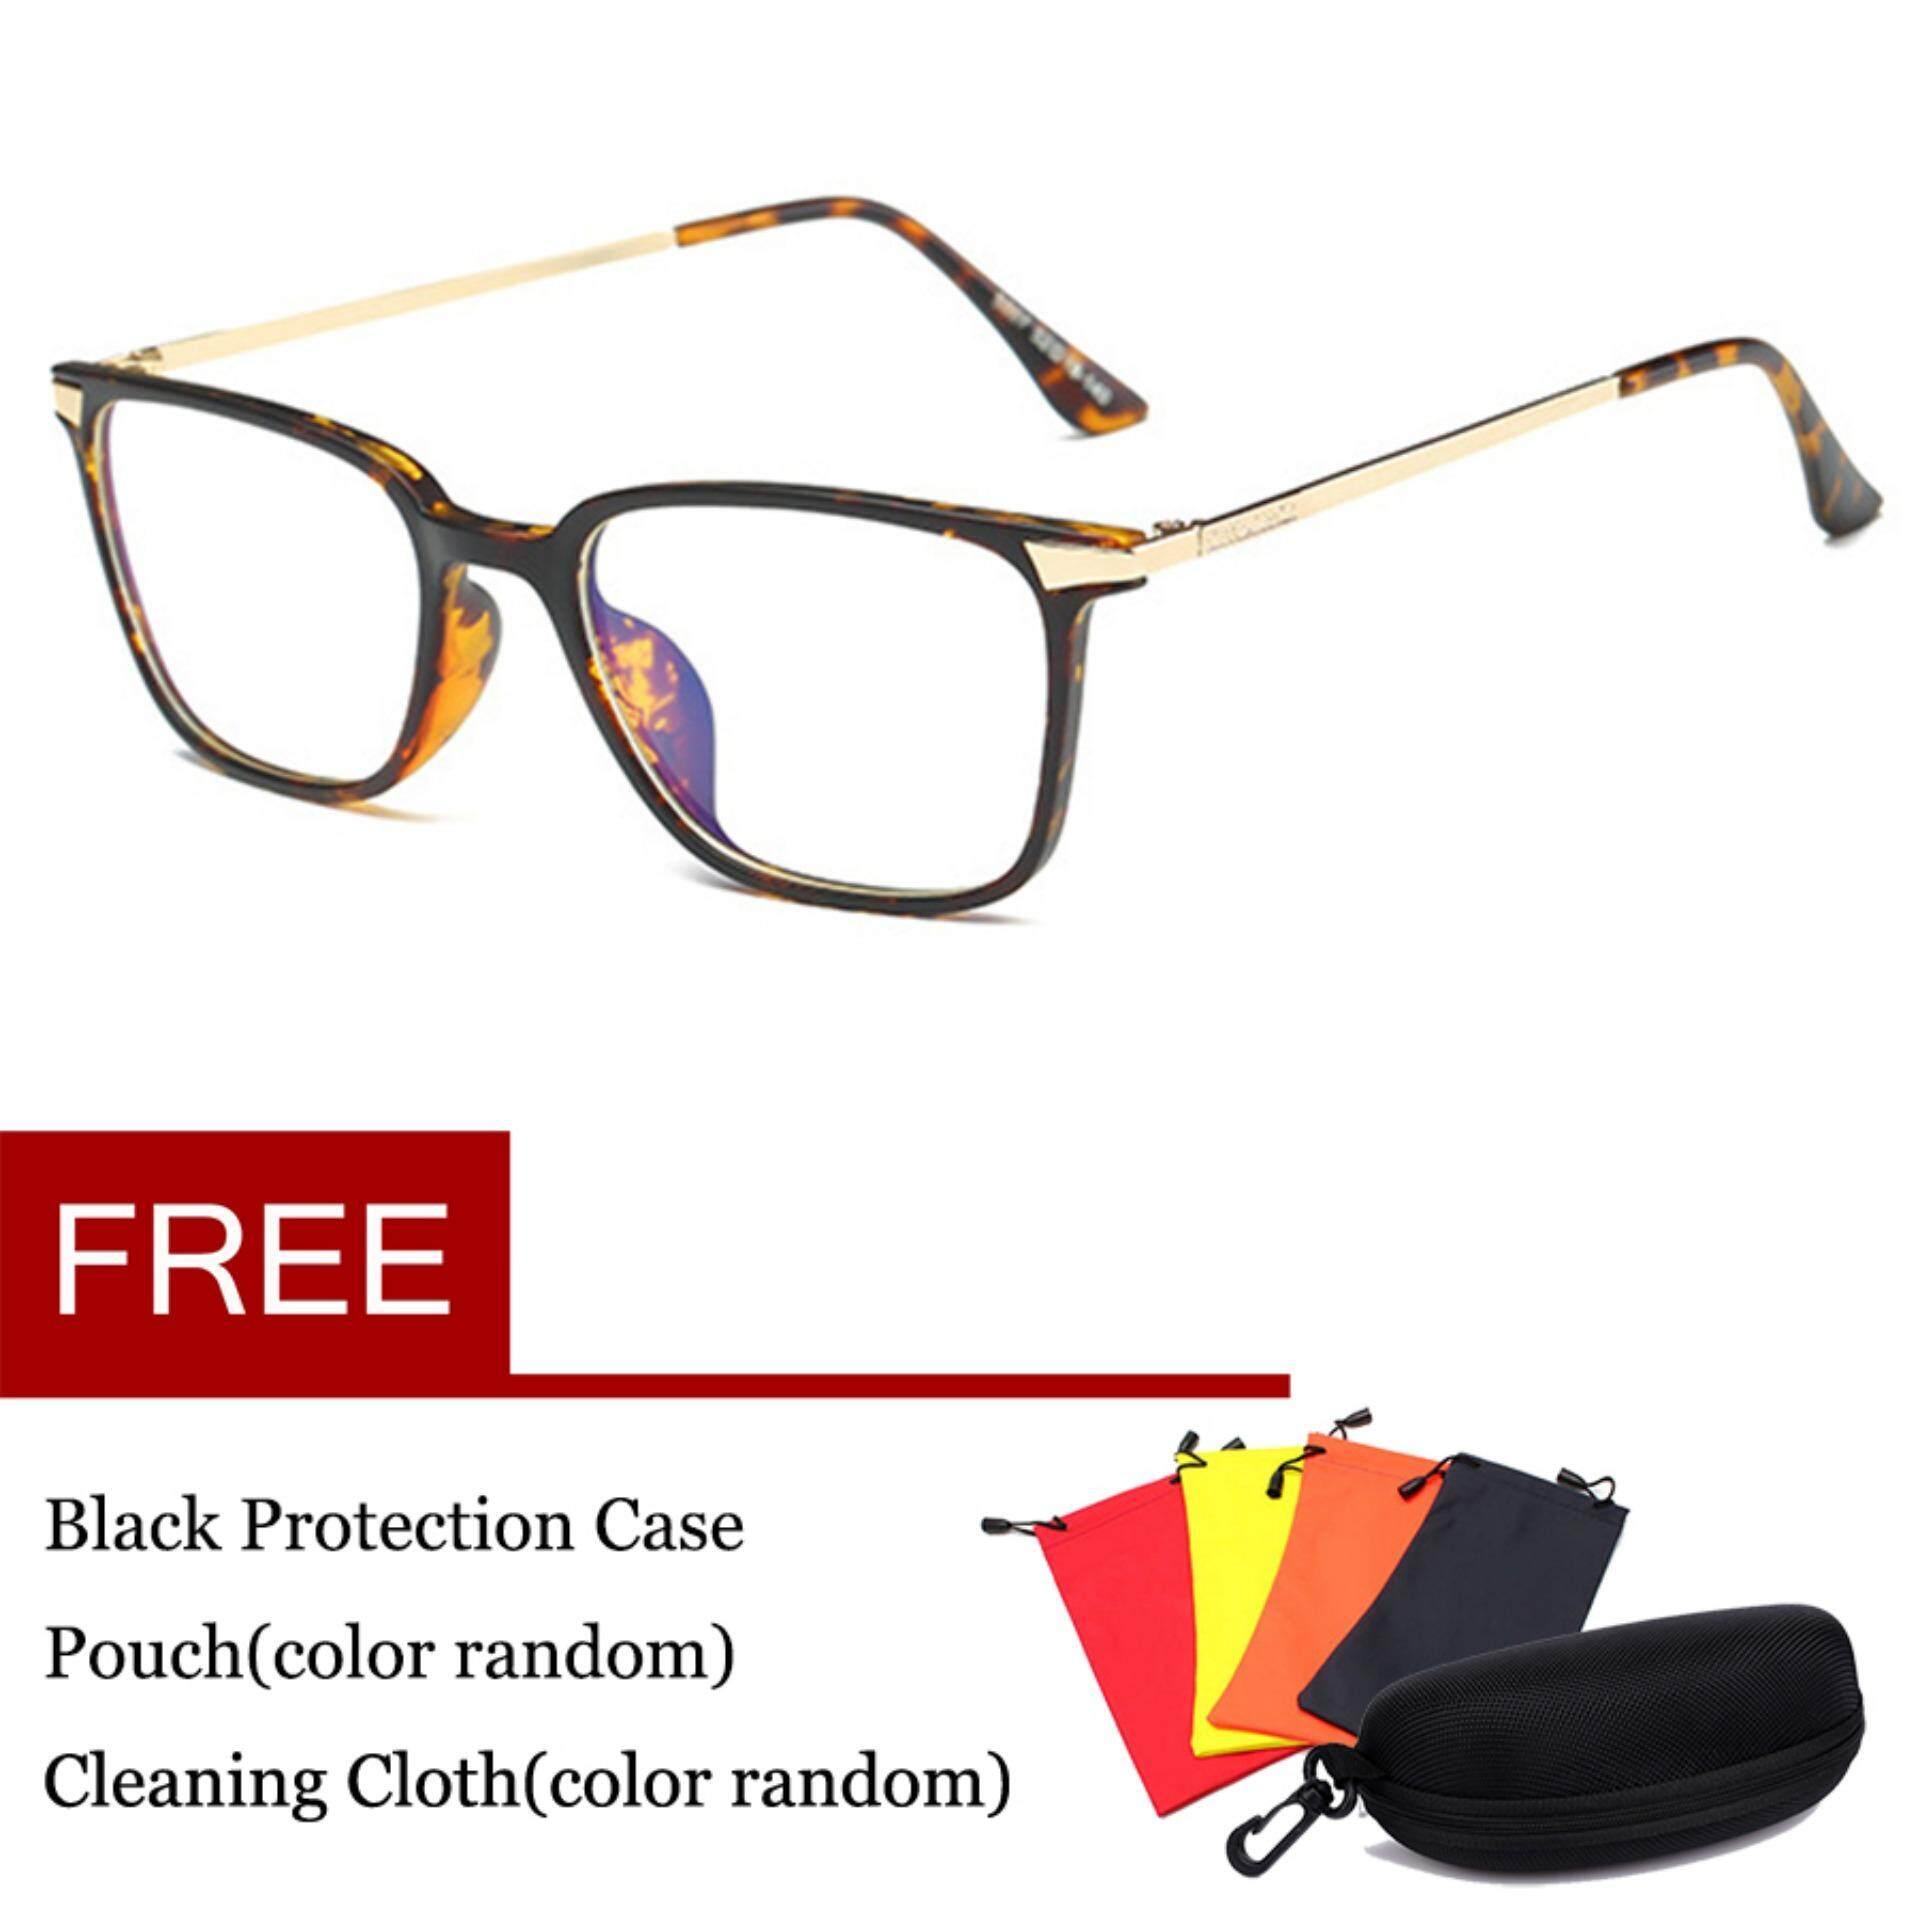 Computer Gaming Glasses Anti Blue Light Anti Reflective Anti Glare Anti Eye Strain Lens 100% Uv Protection 0.00x Eyewear 5007 By Thomasstore.